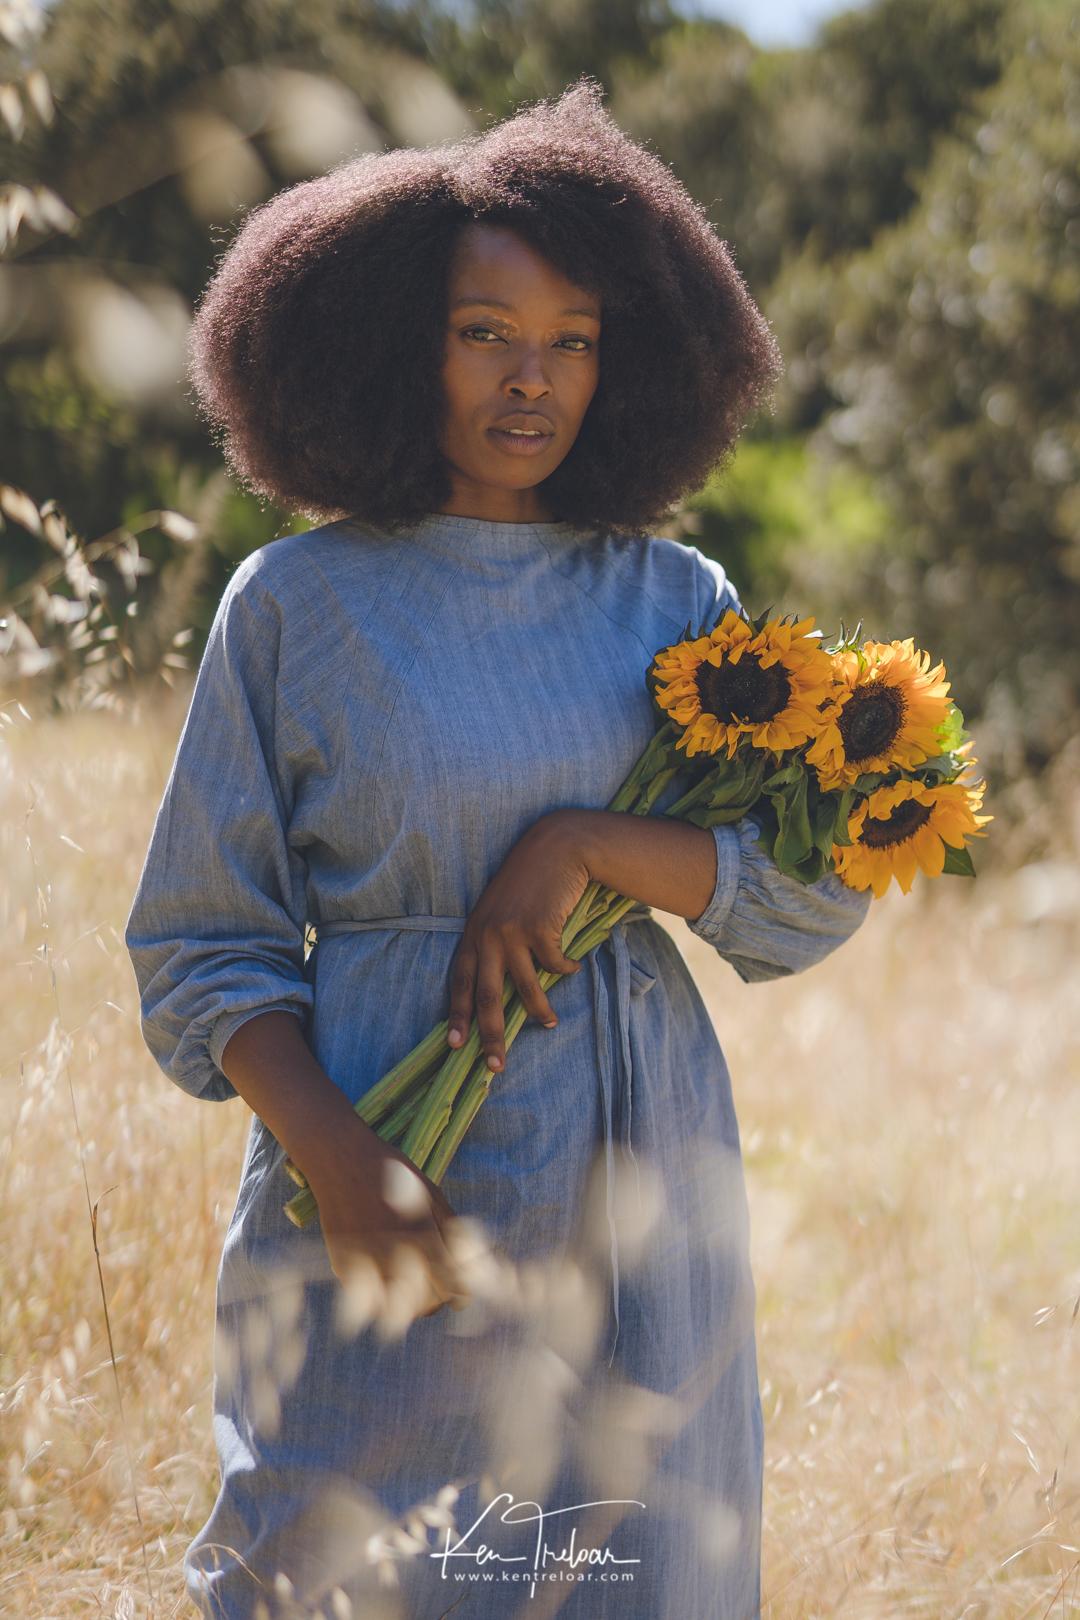 Ken Treloar Photography - Natural L-ight Editorial Portrait Fashion Photo Session - Cape Town Dec 2018-4.jpg